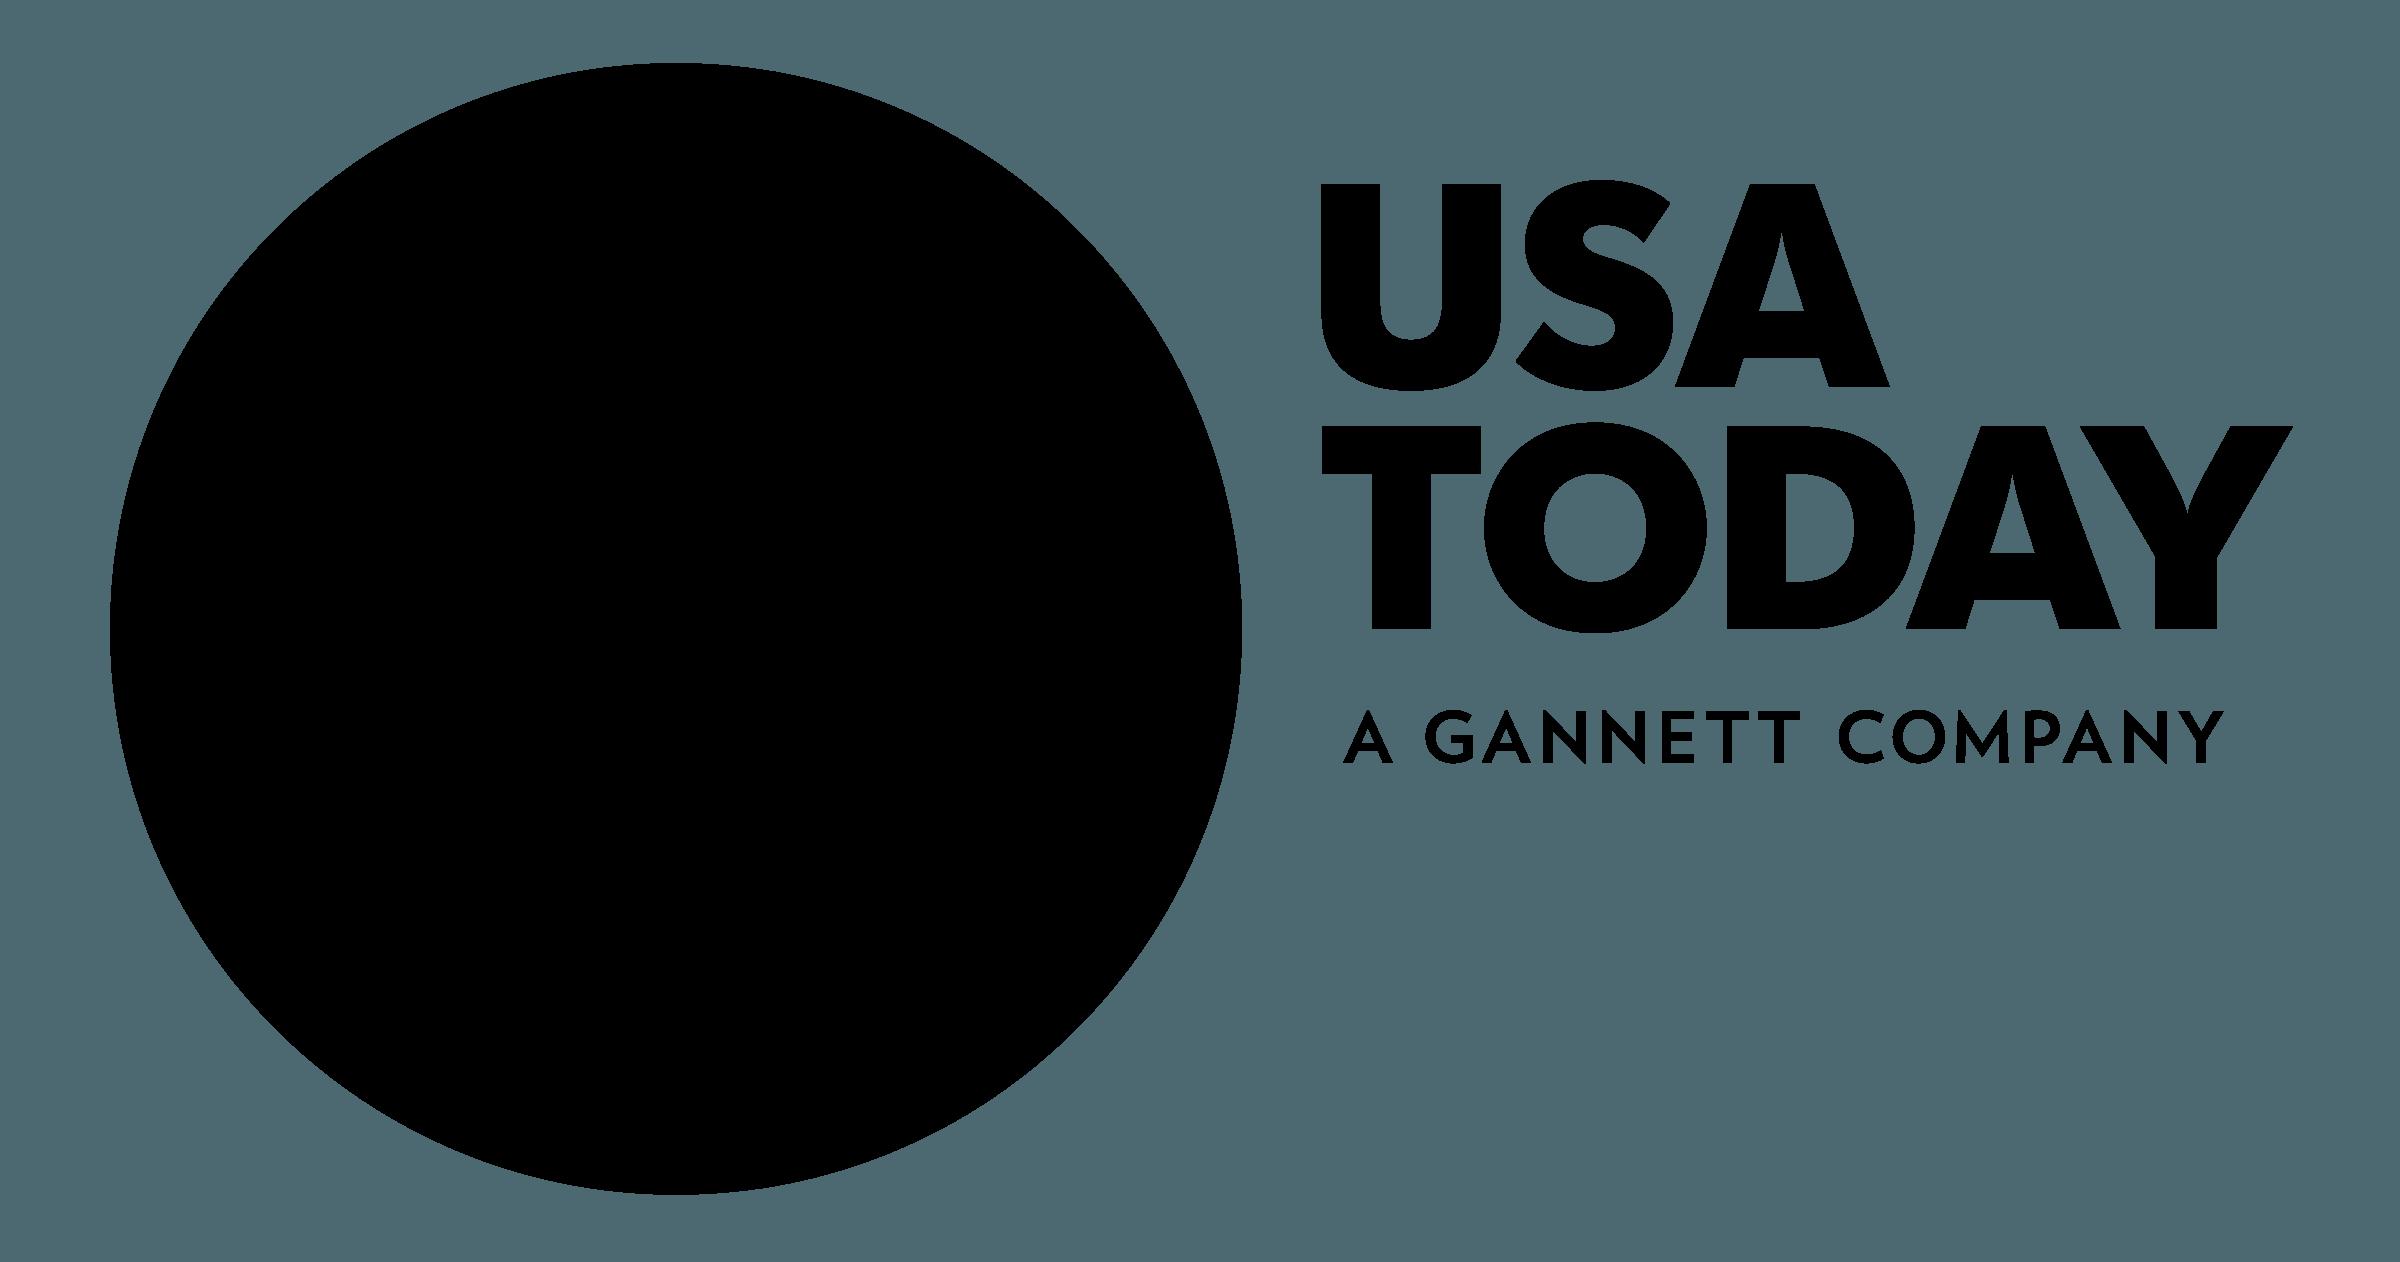 USA Today Logo PNG Transparent & SVG Vector.